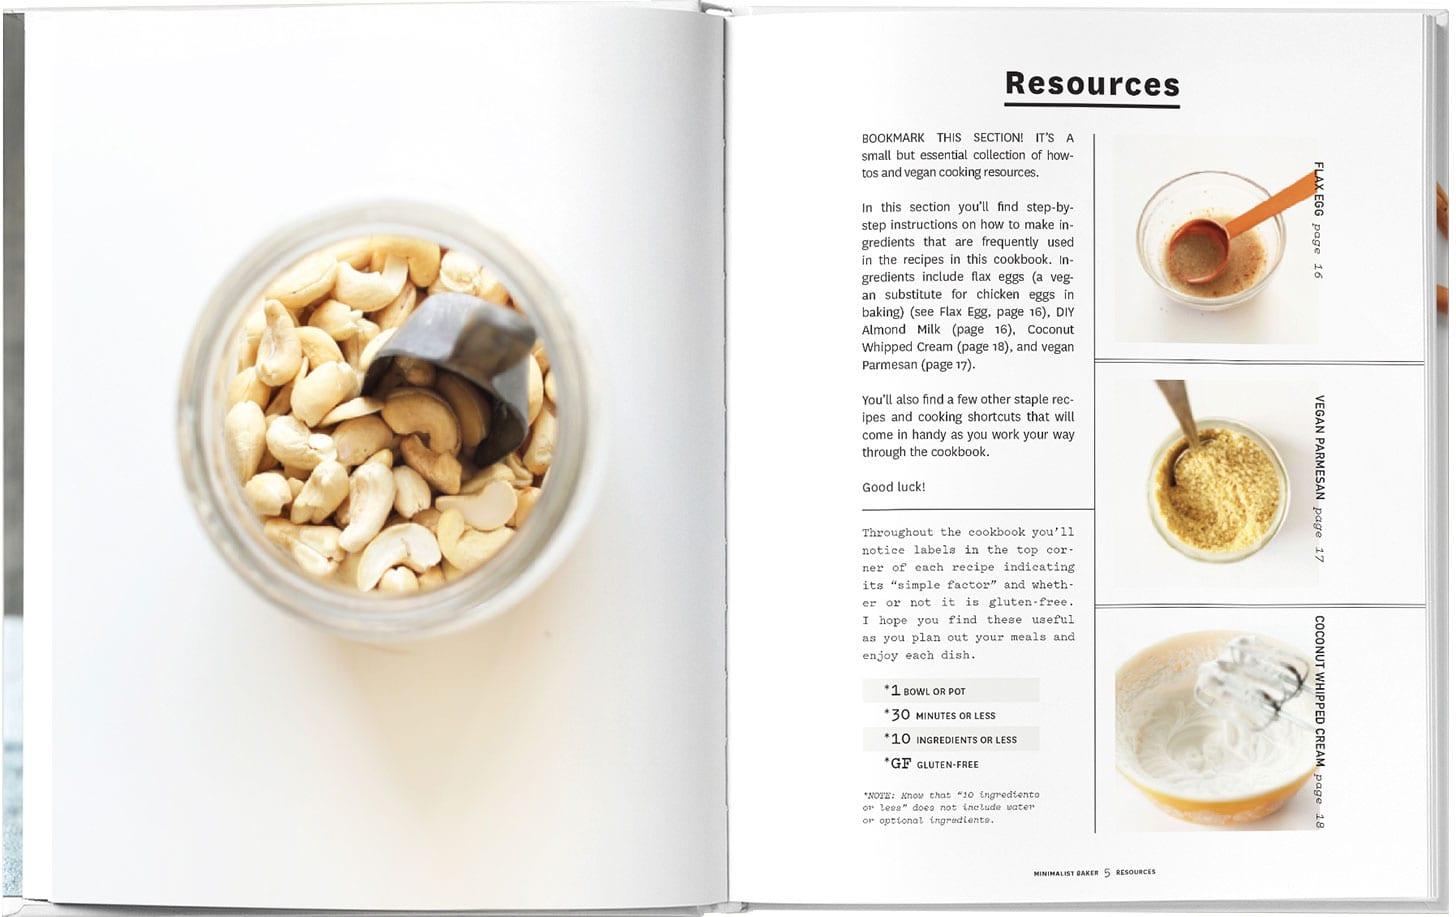 Minimalist-Bakers-Everyday-Cooking-Cookbook-1